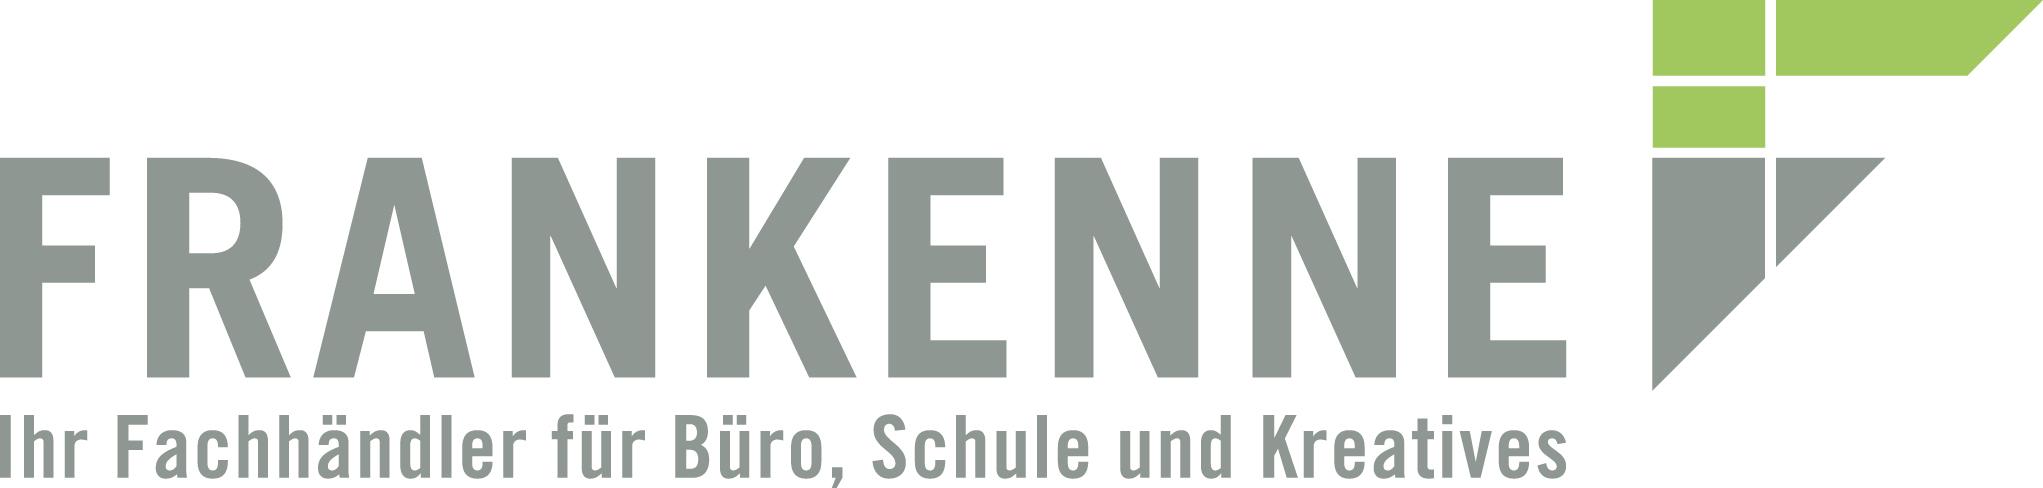 Frankenne GmbH